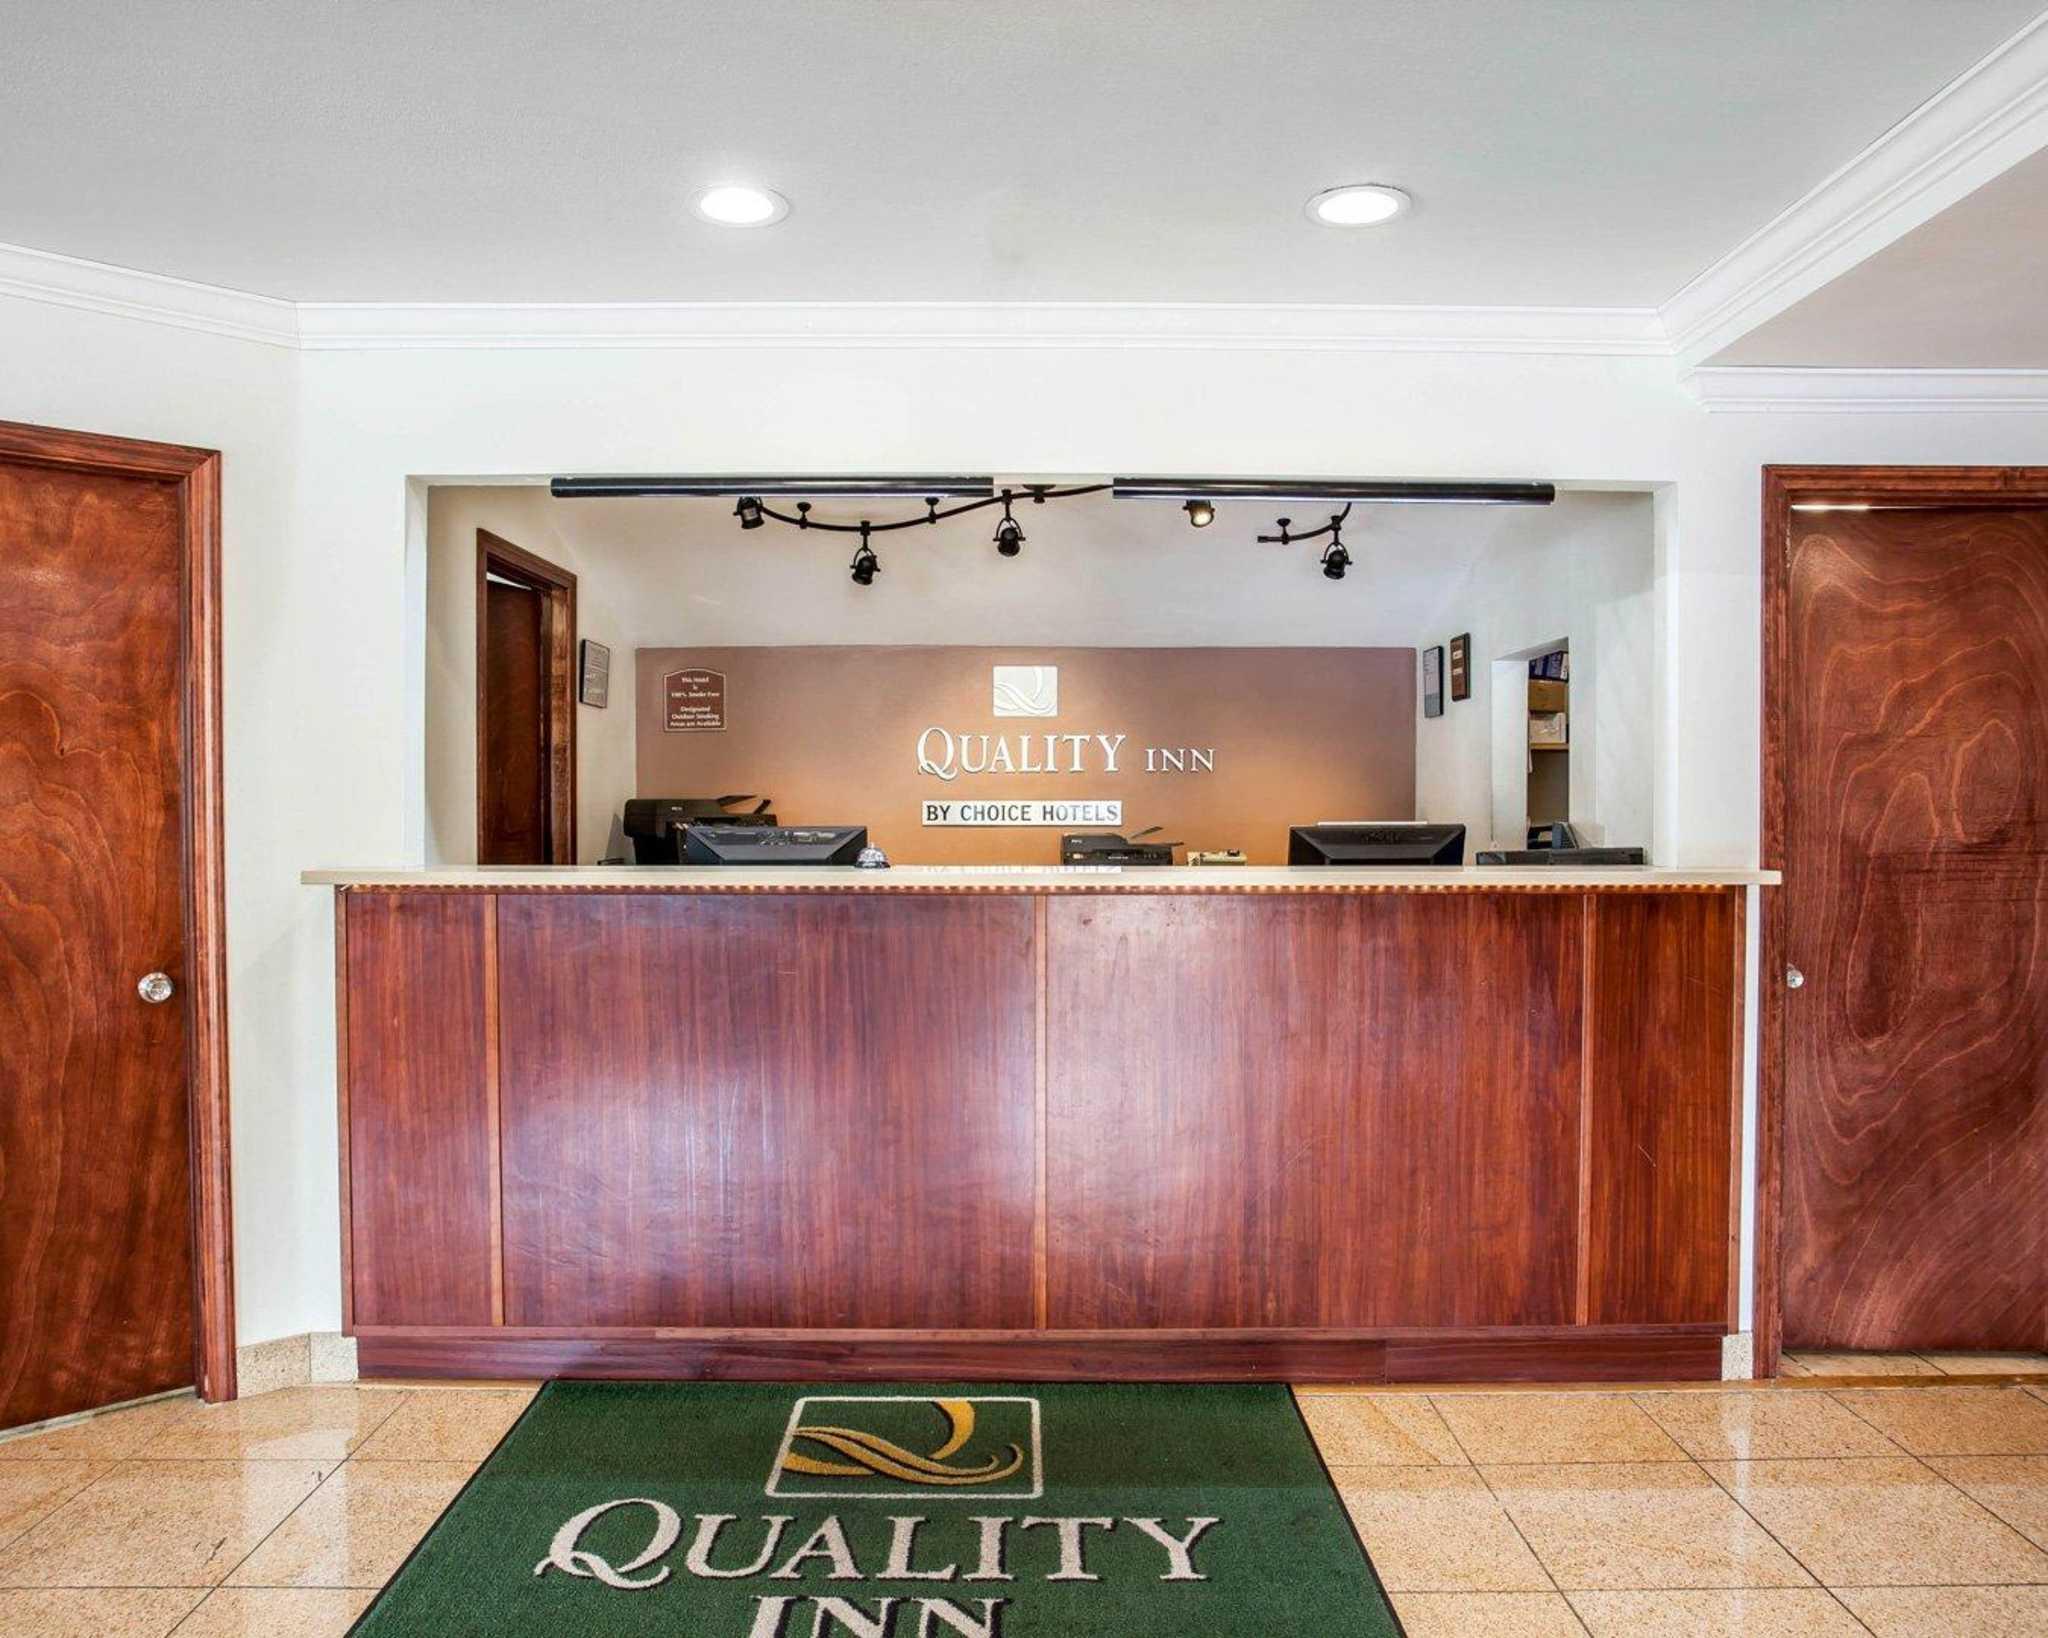 Quality Inn Sea-Tac Airport image 18